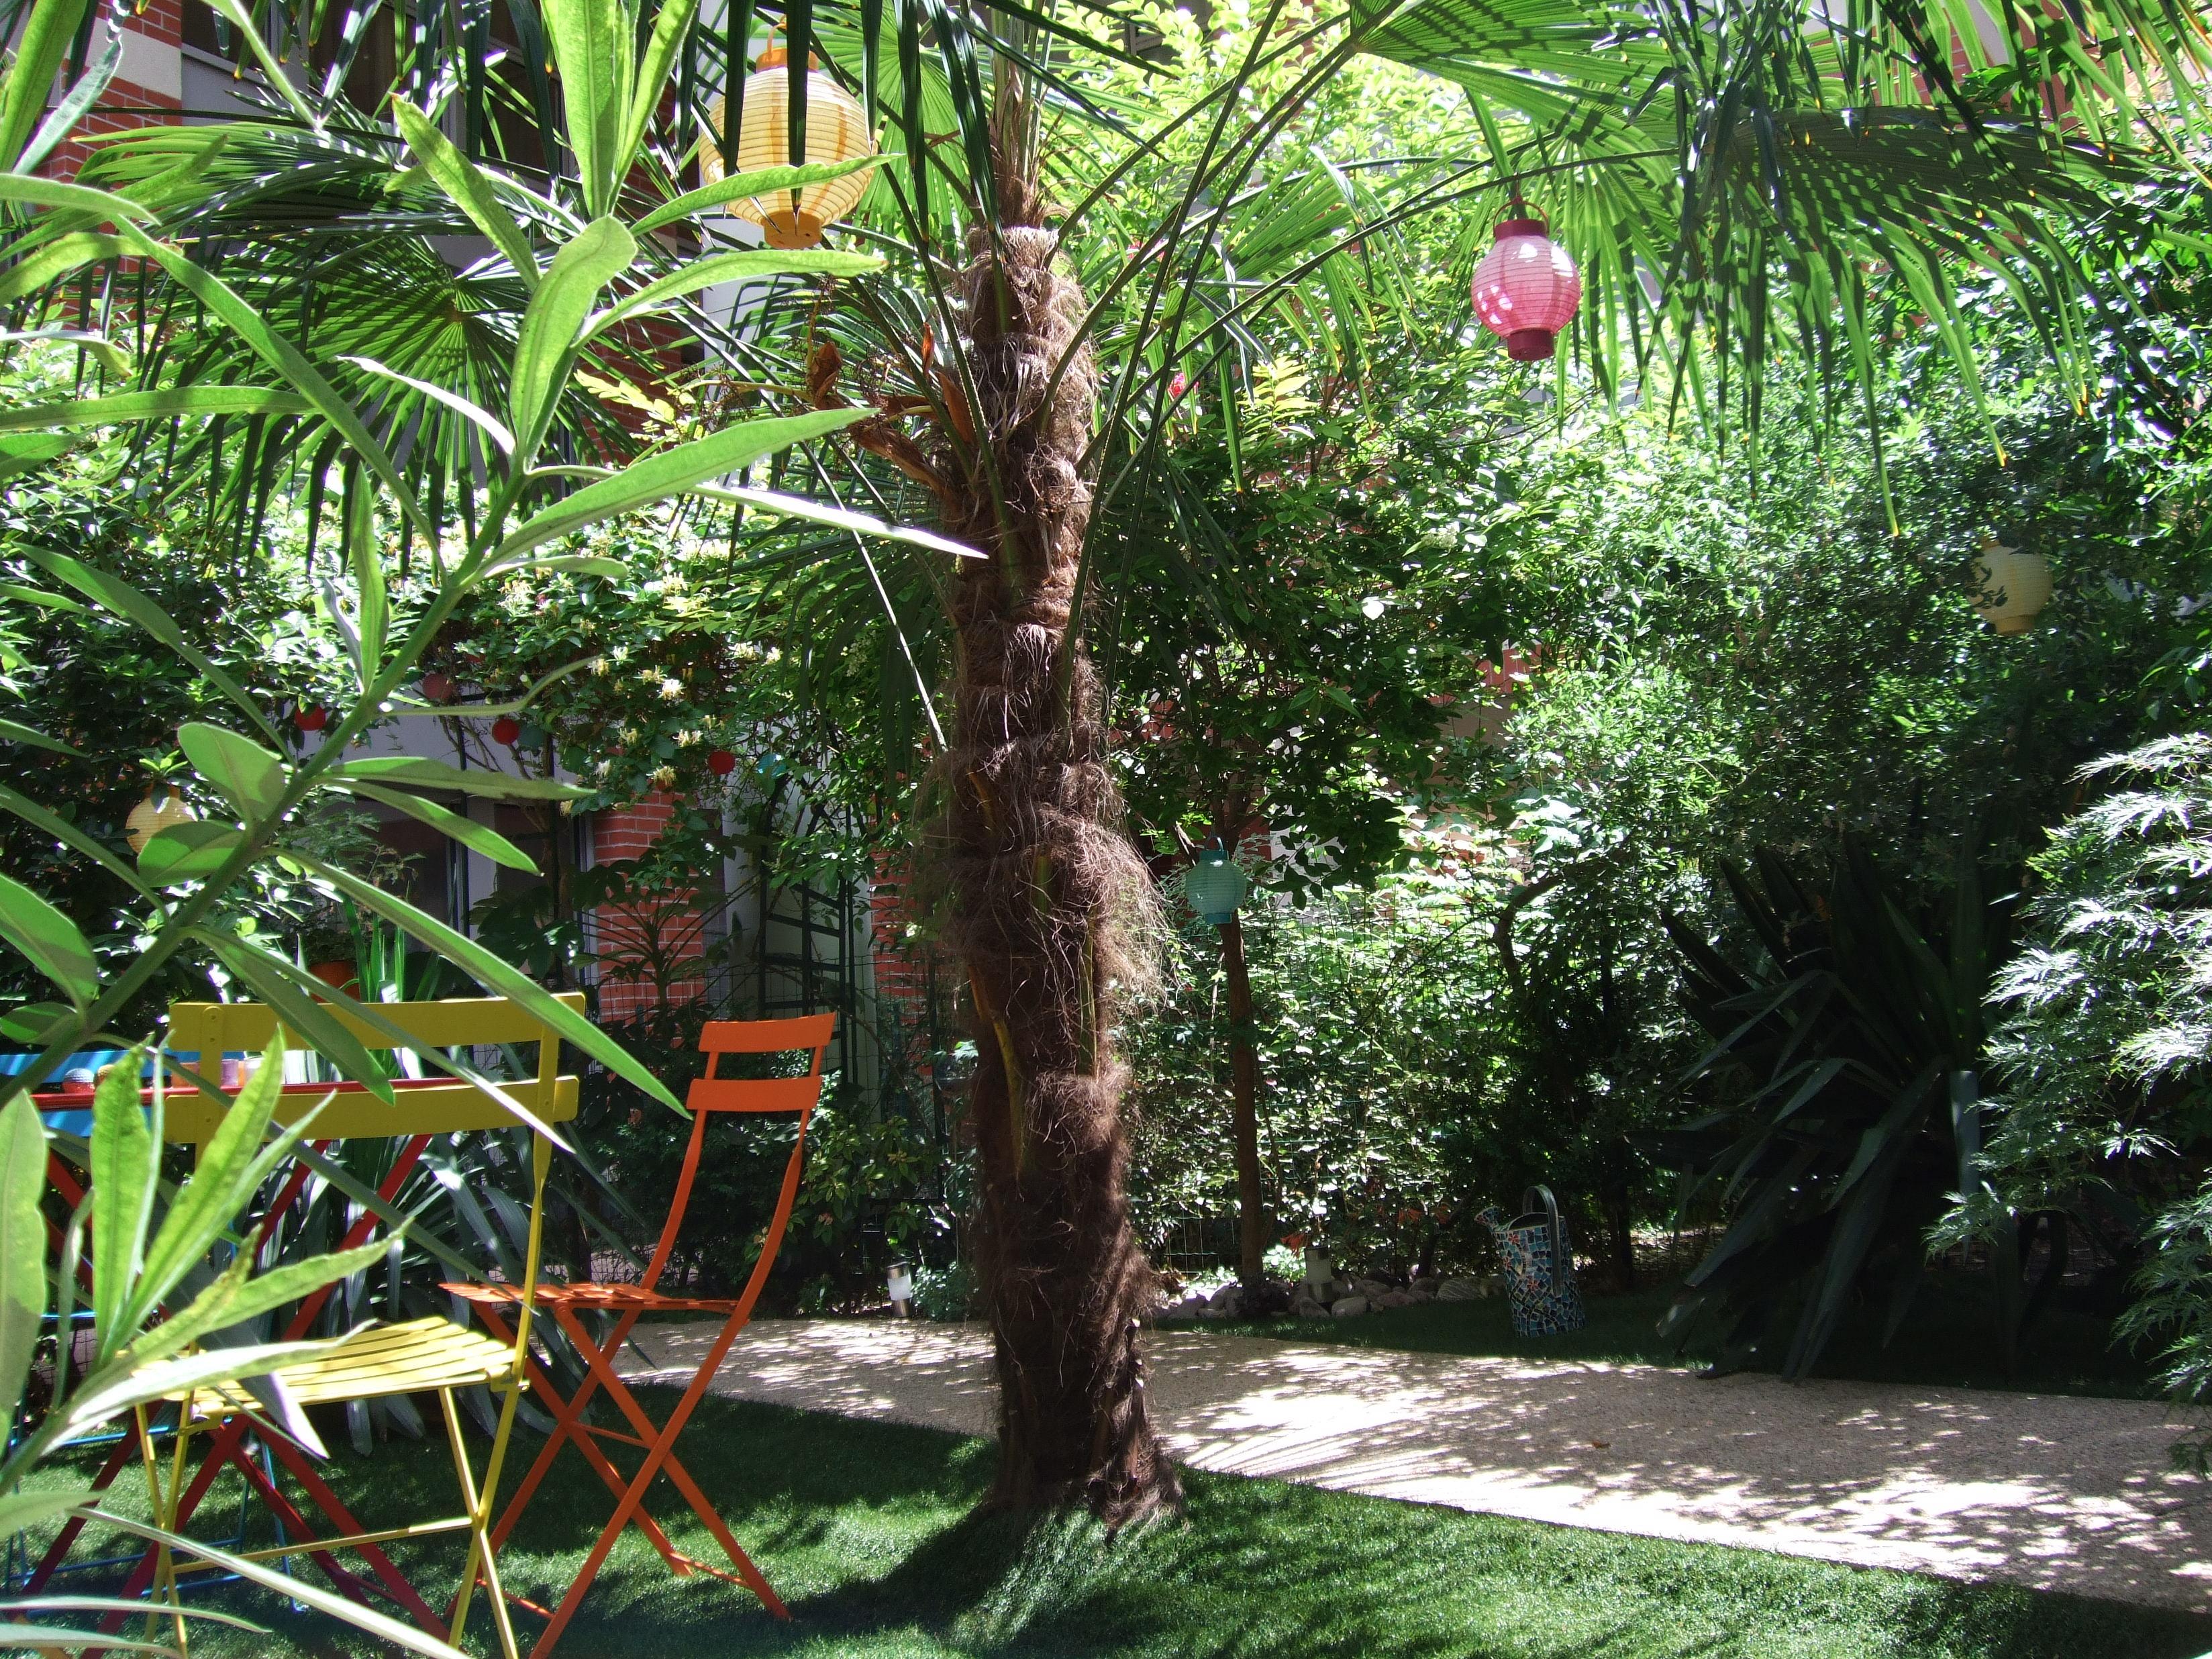 Nathalie charbonnier 75019 gamm vert for Le jardin 75019